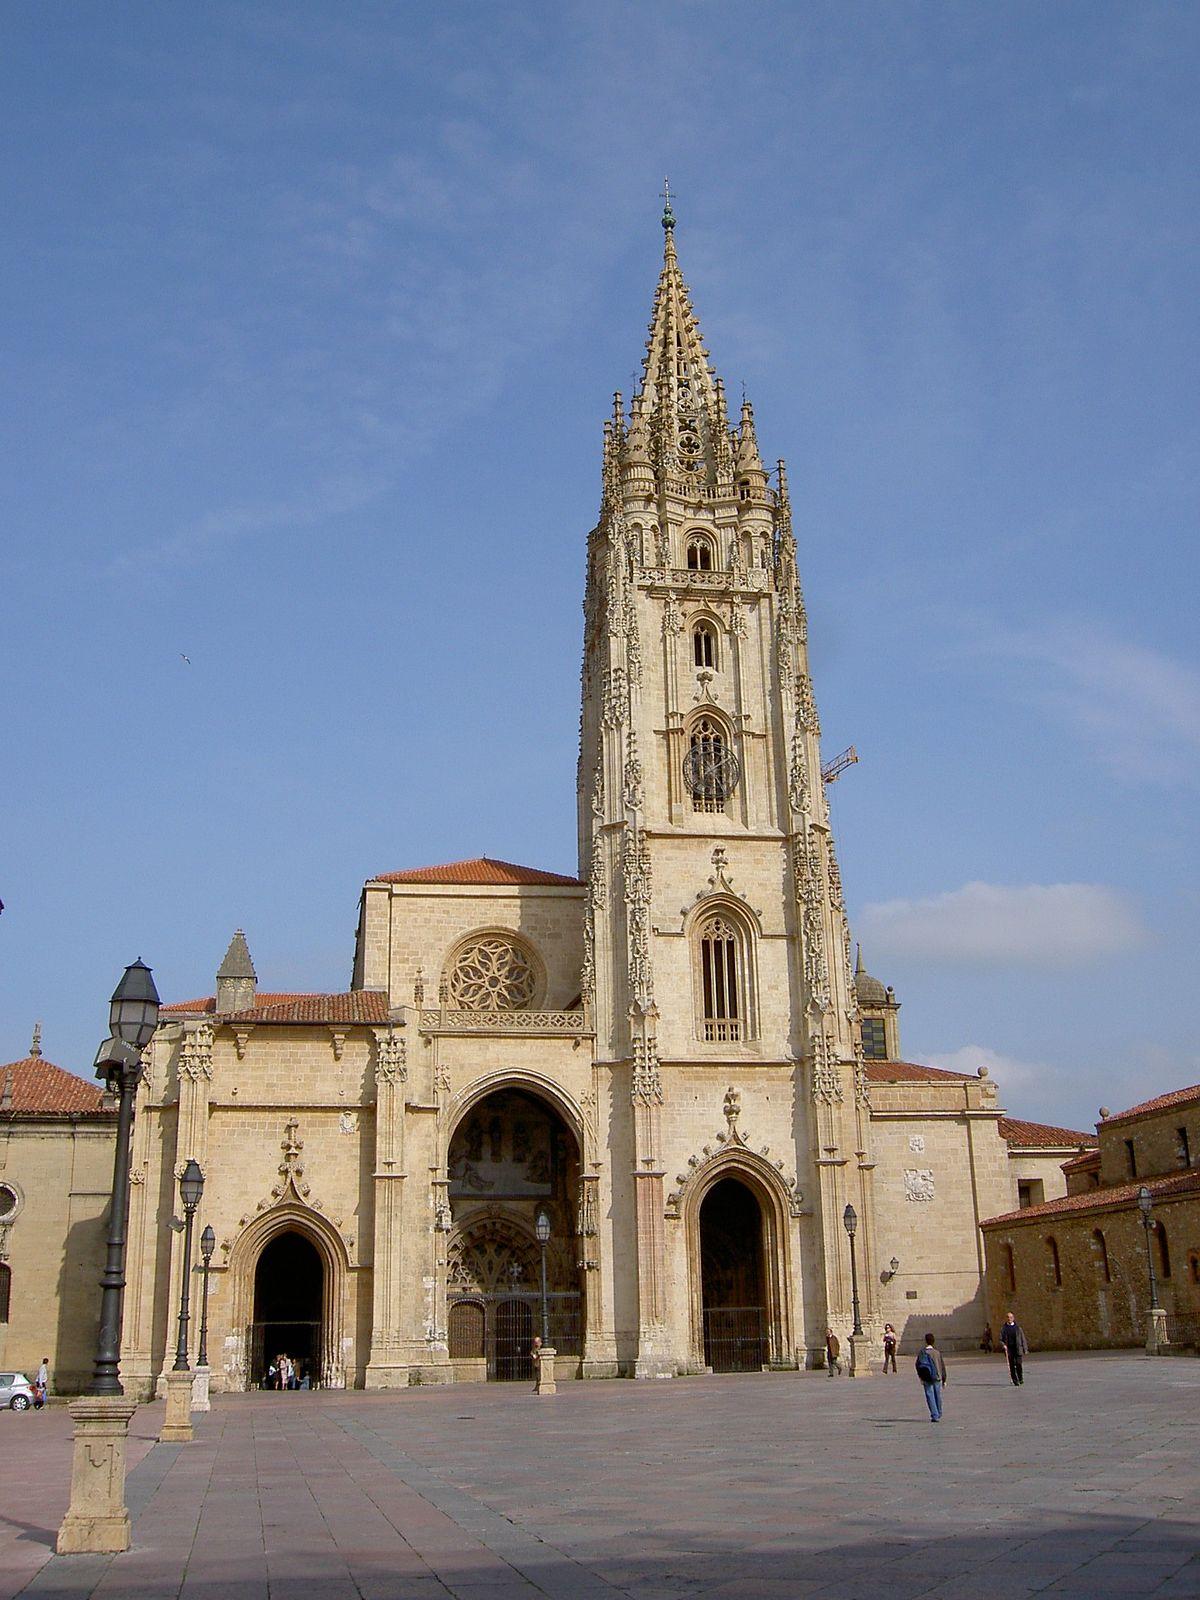 Catedral de Oviedo - Wikipedia, la enciclopedia libre